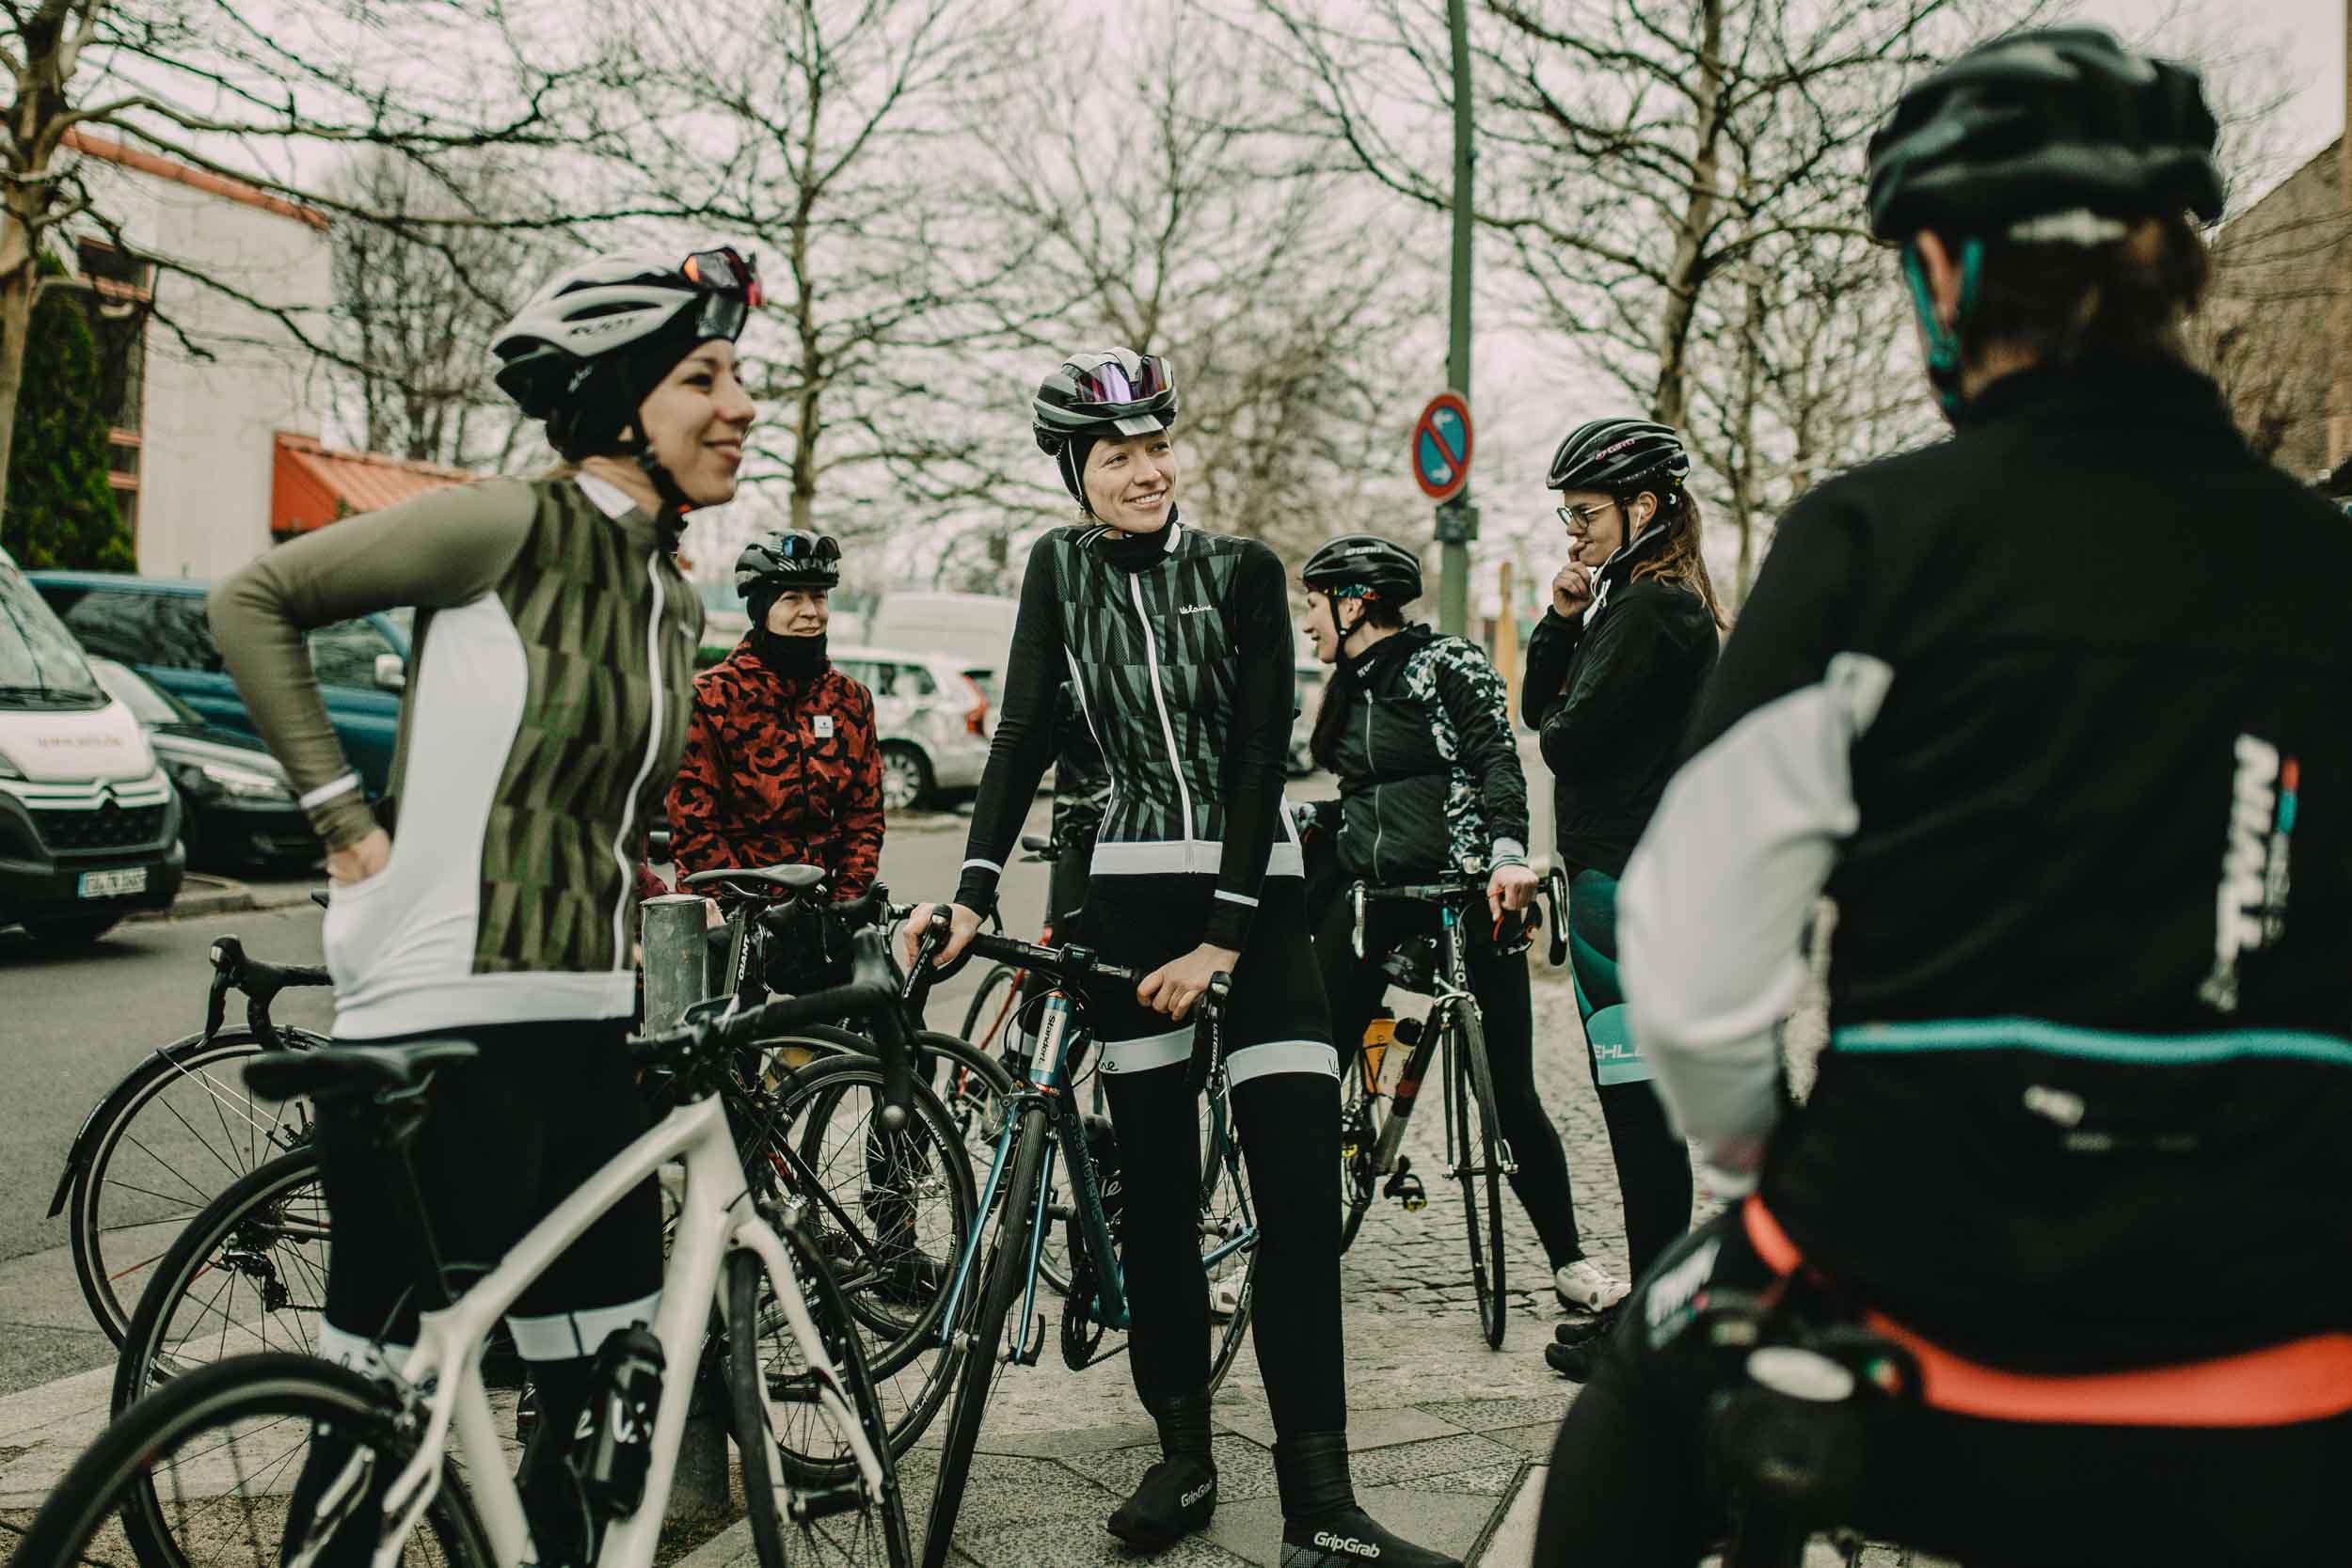 Kolektif_BikeFair_Berlin_YHutterer_Web_131.jpg